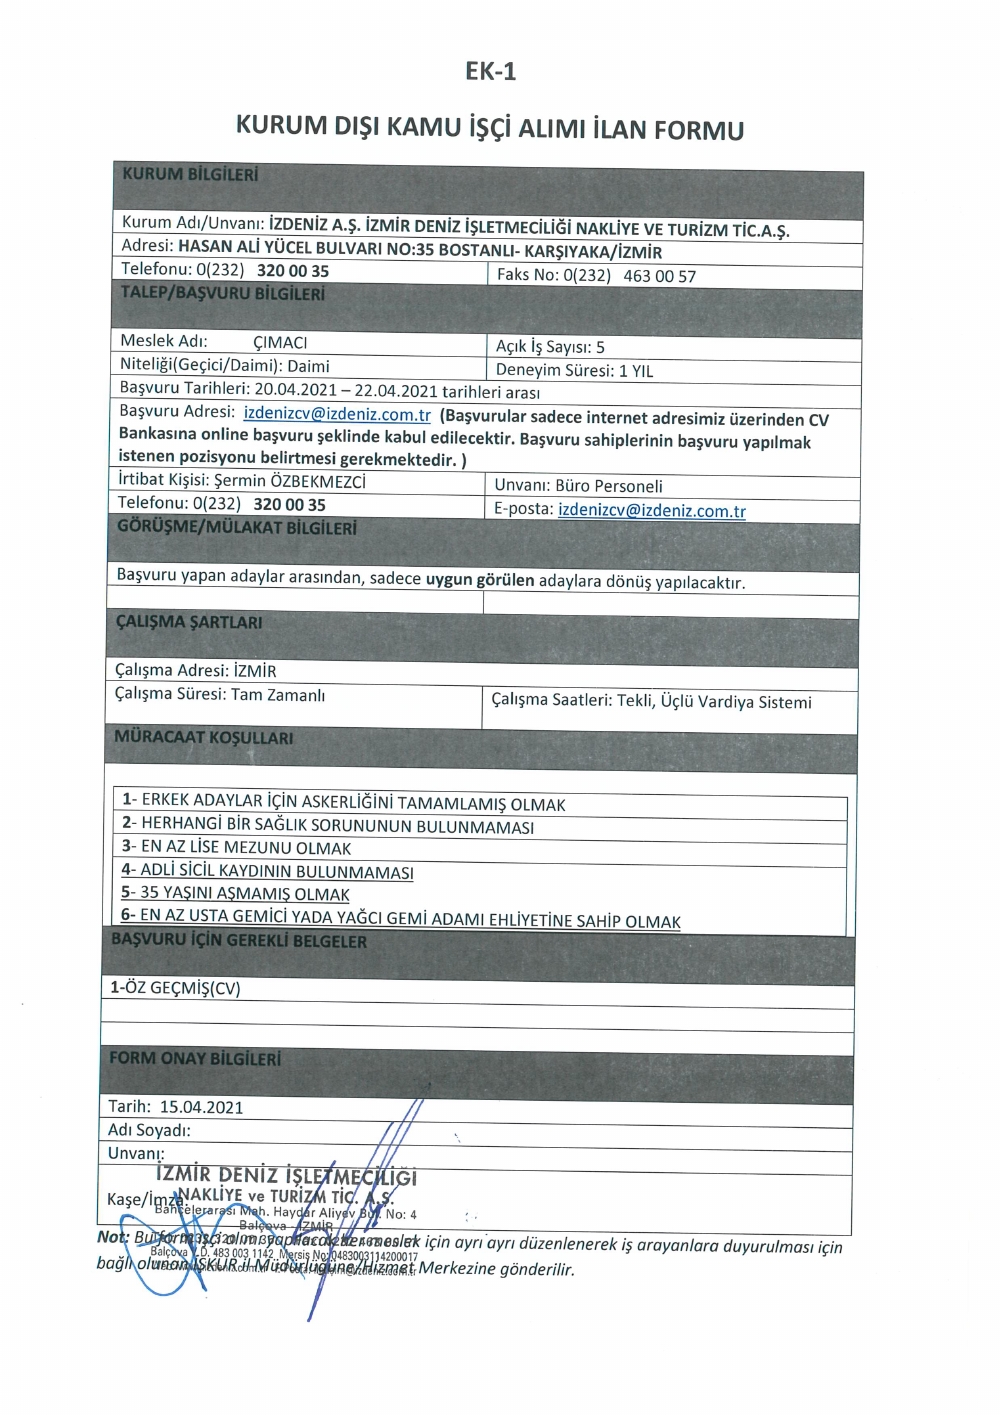 izmir-izdeniz-a-s-22-04-2021-000003.png